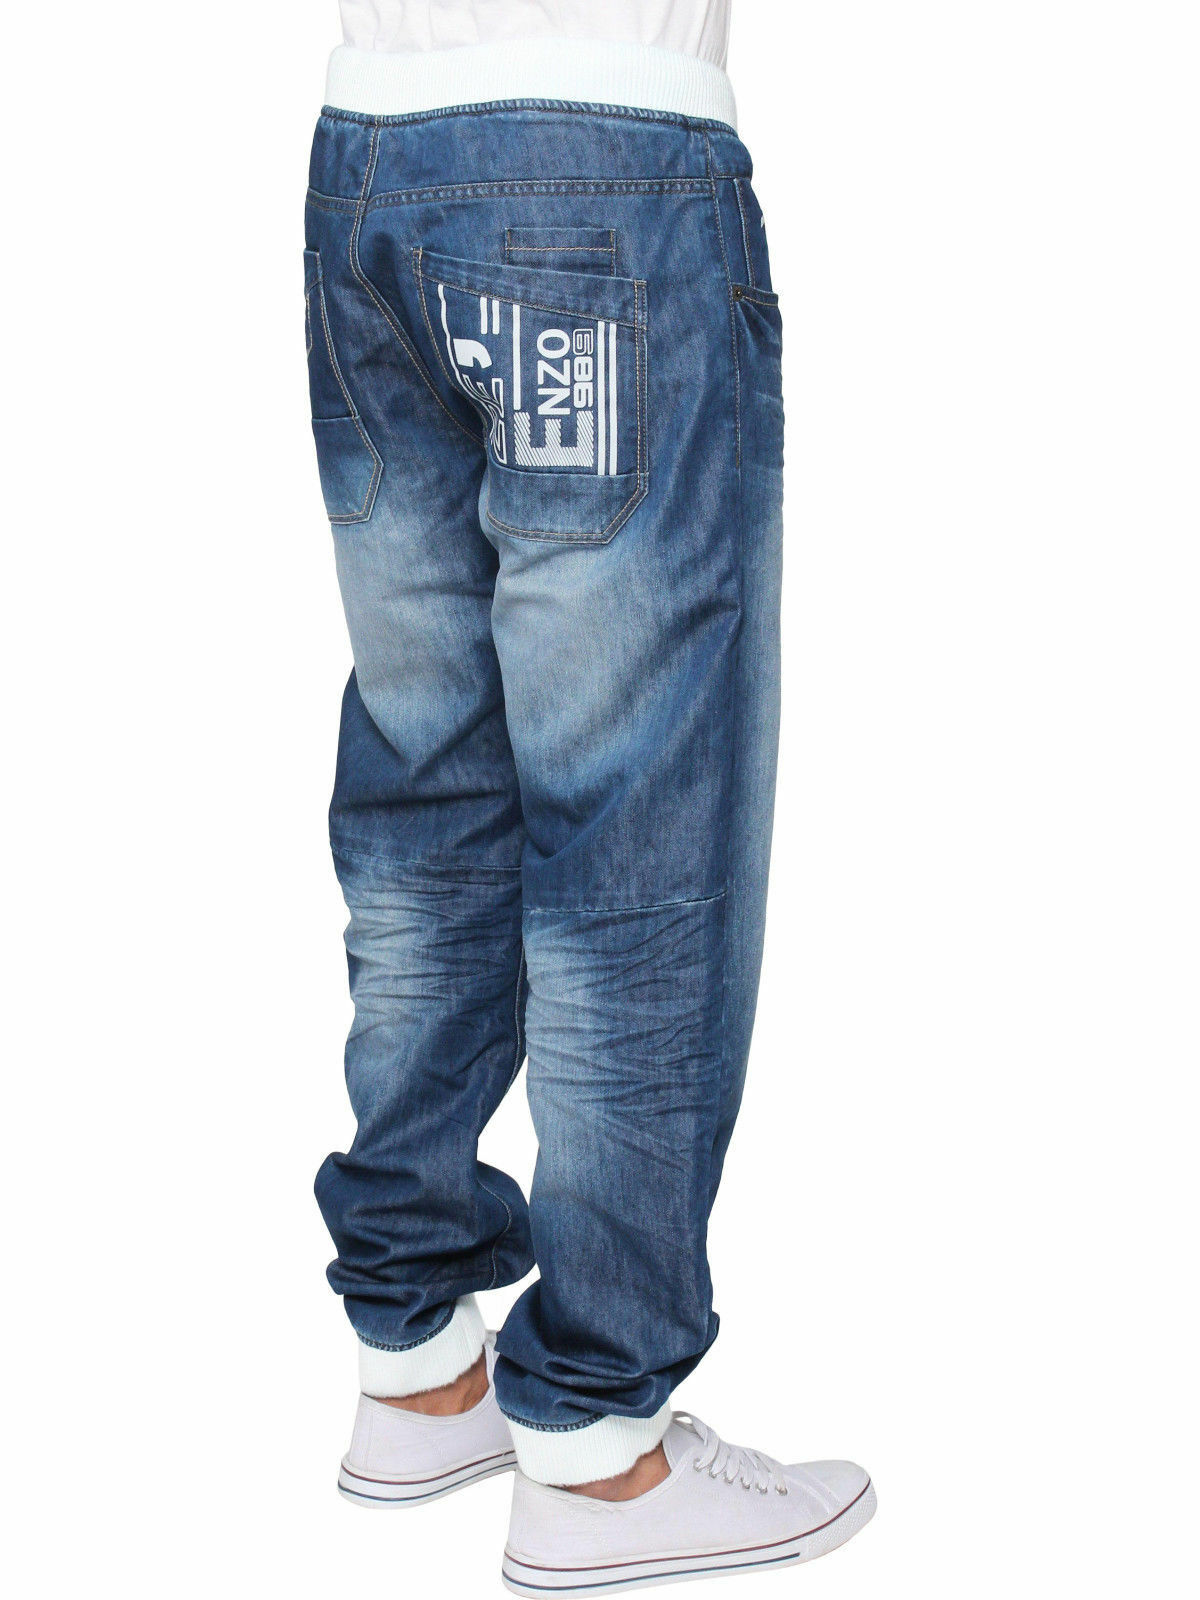 Enzo Boys Kids EZB188 Grey Cuffed Joggers 24 to 29 Reduced